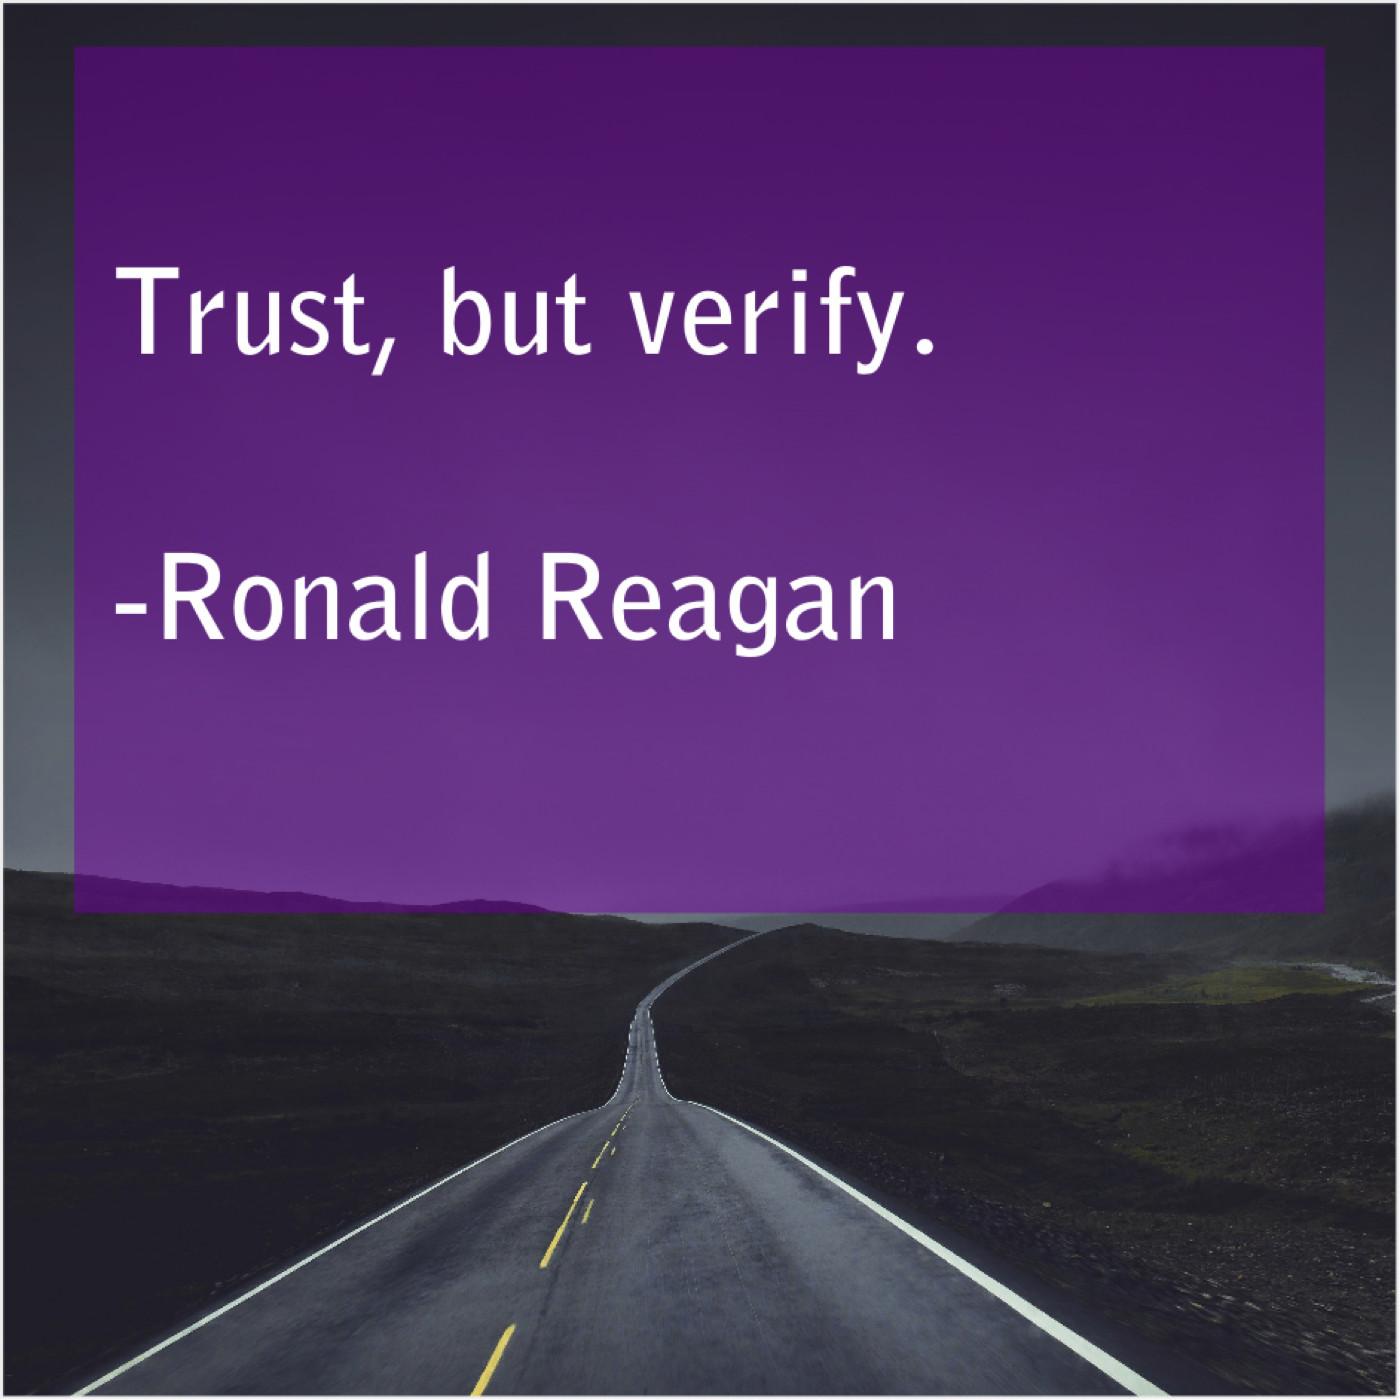 Ronald Reagan Trust But Verify Quote Trumpet